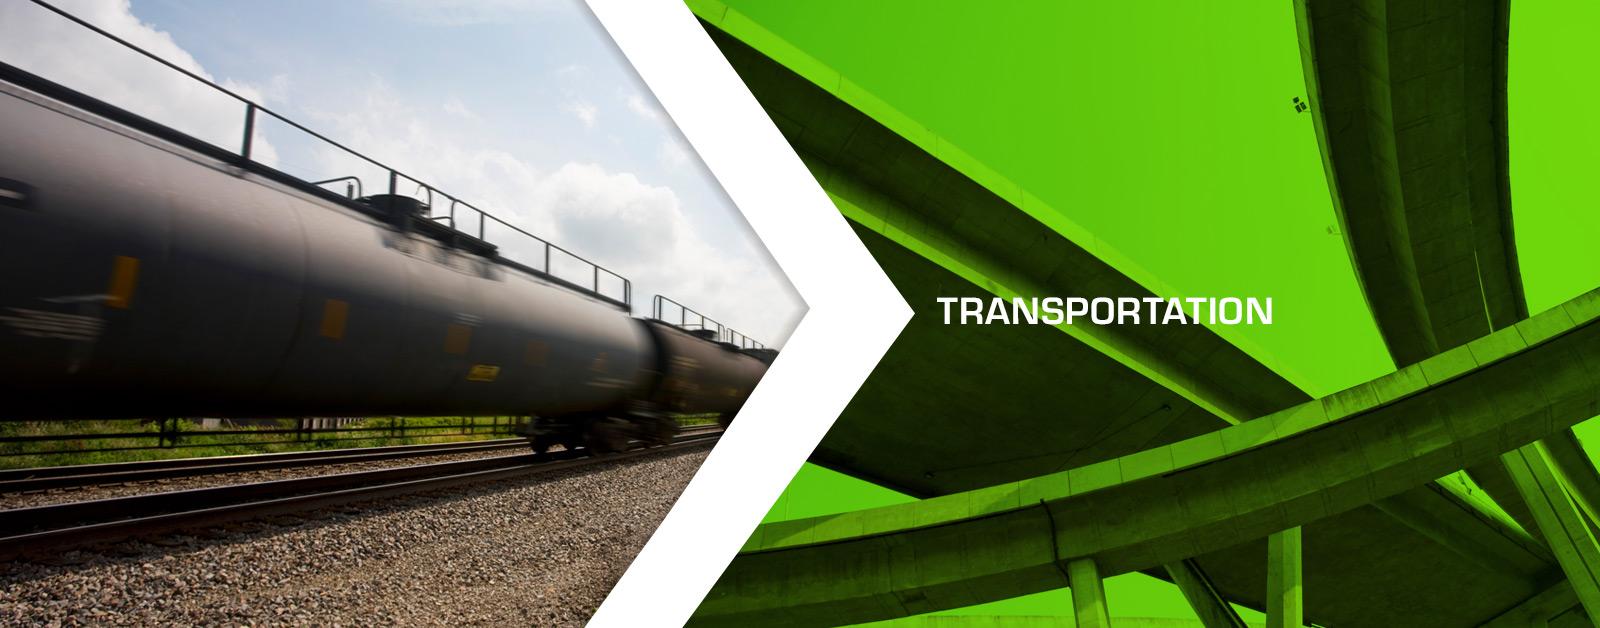 transportation engineering firm